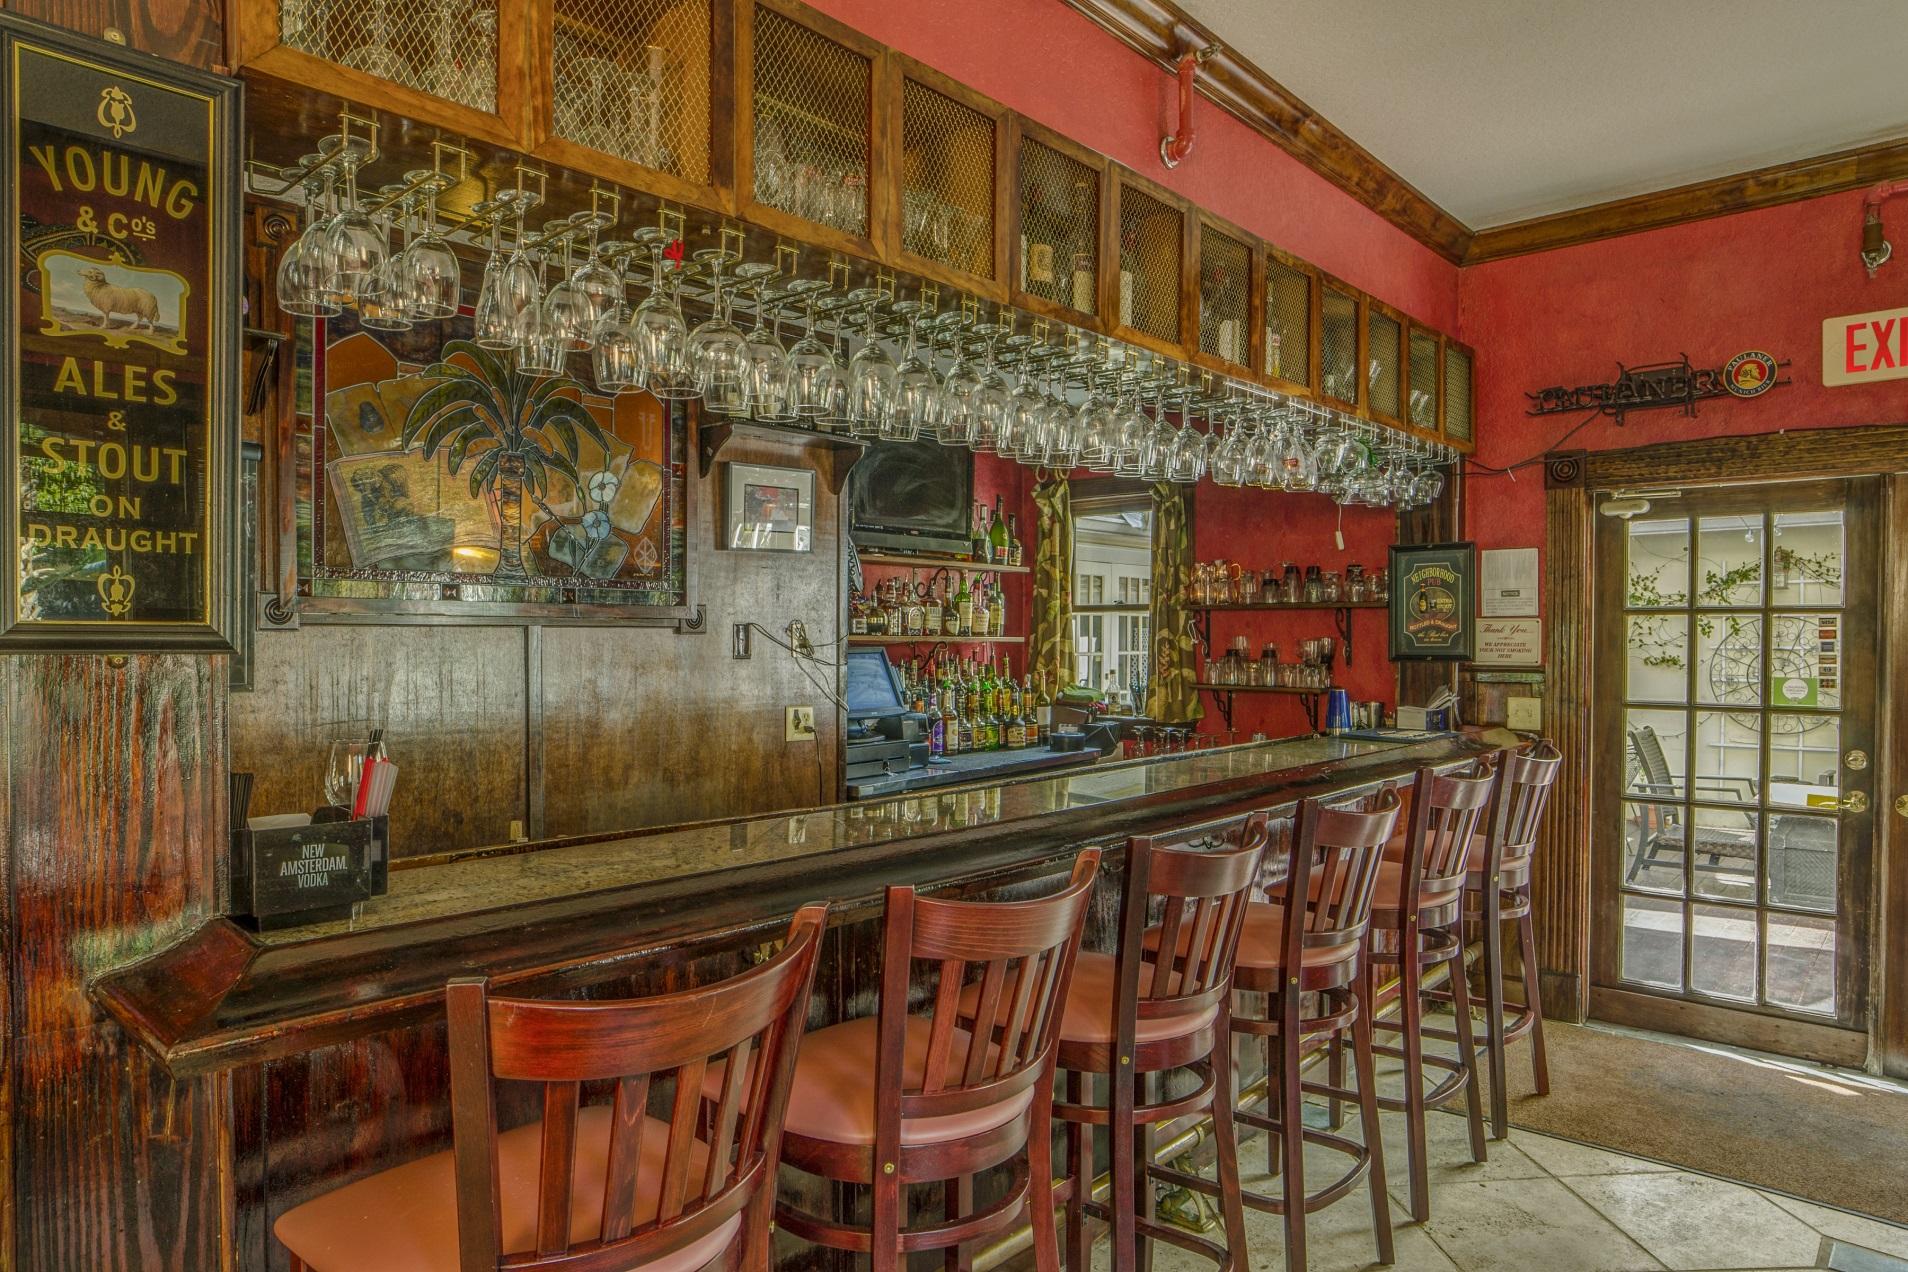 Isabelle's bar interior